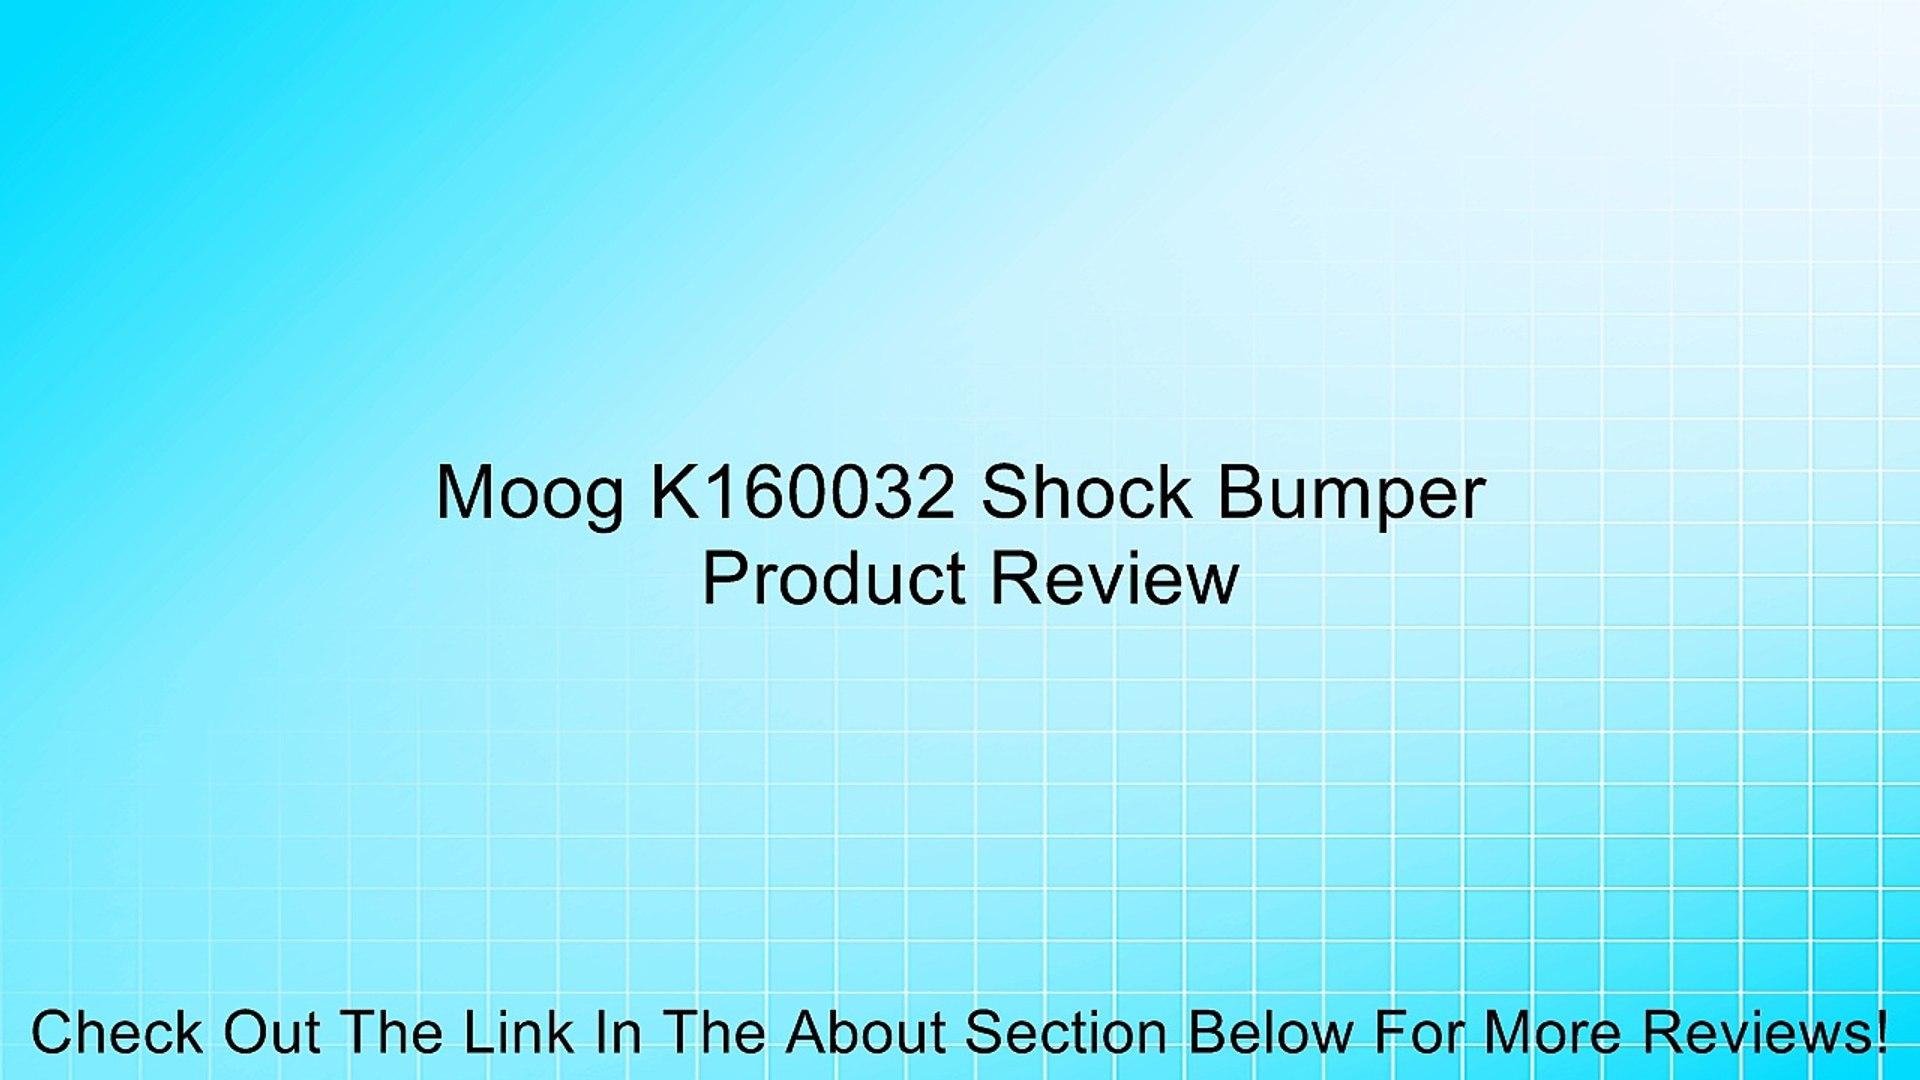 Moog K160032 Shock Bumper